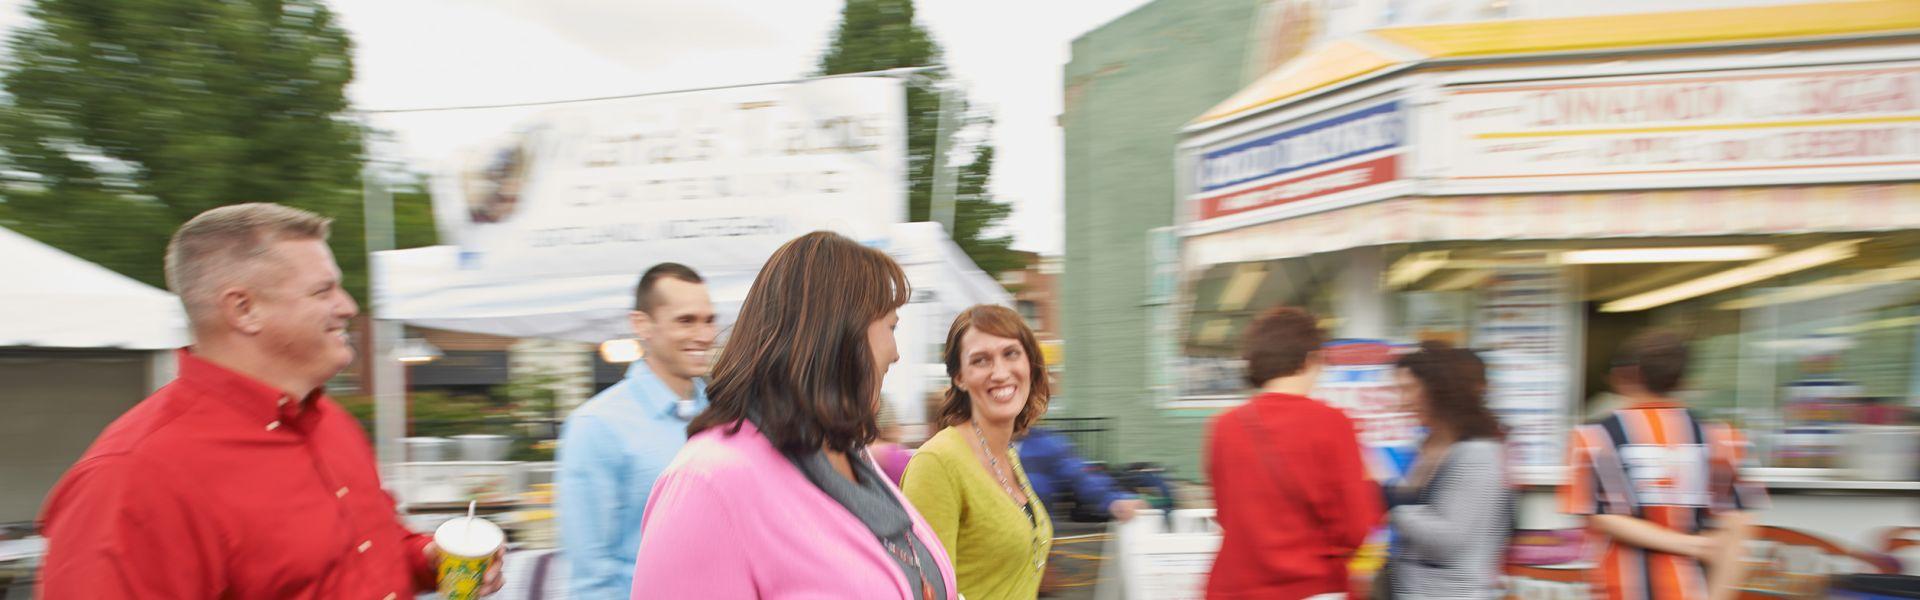 events - lansing, mi - greater lansing convention & visitors bureau